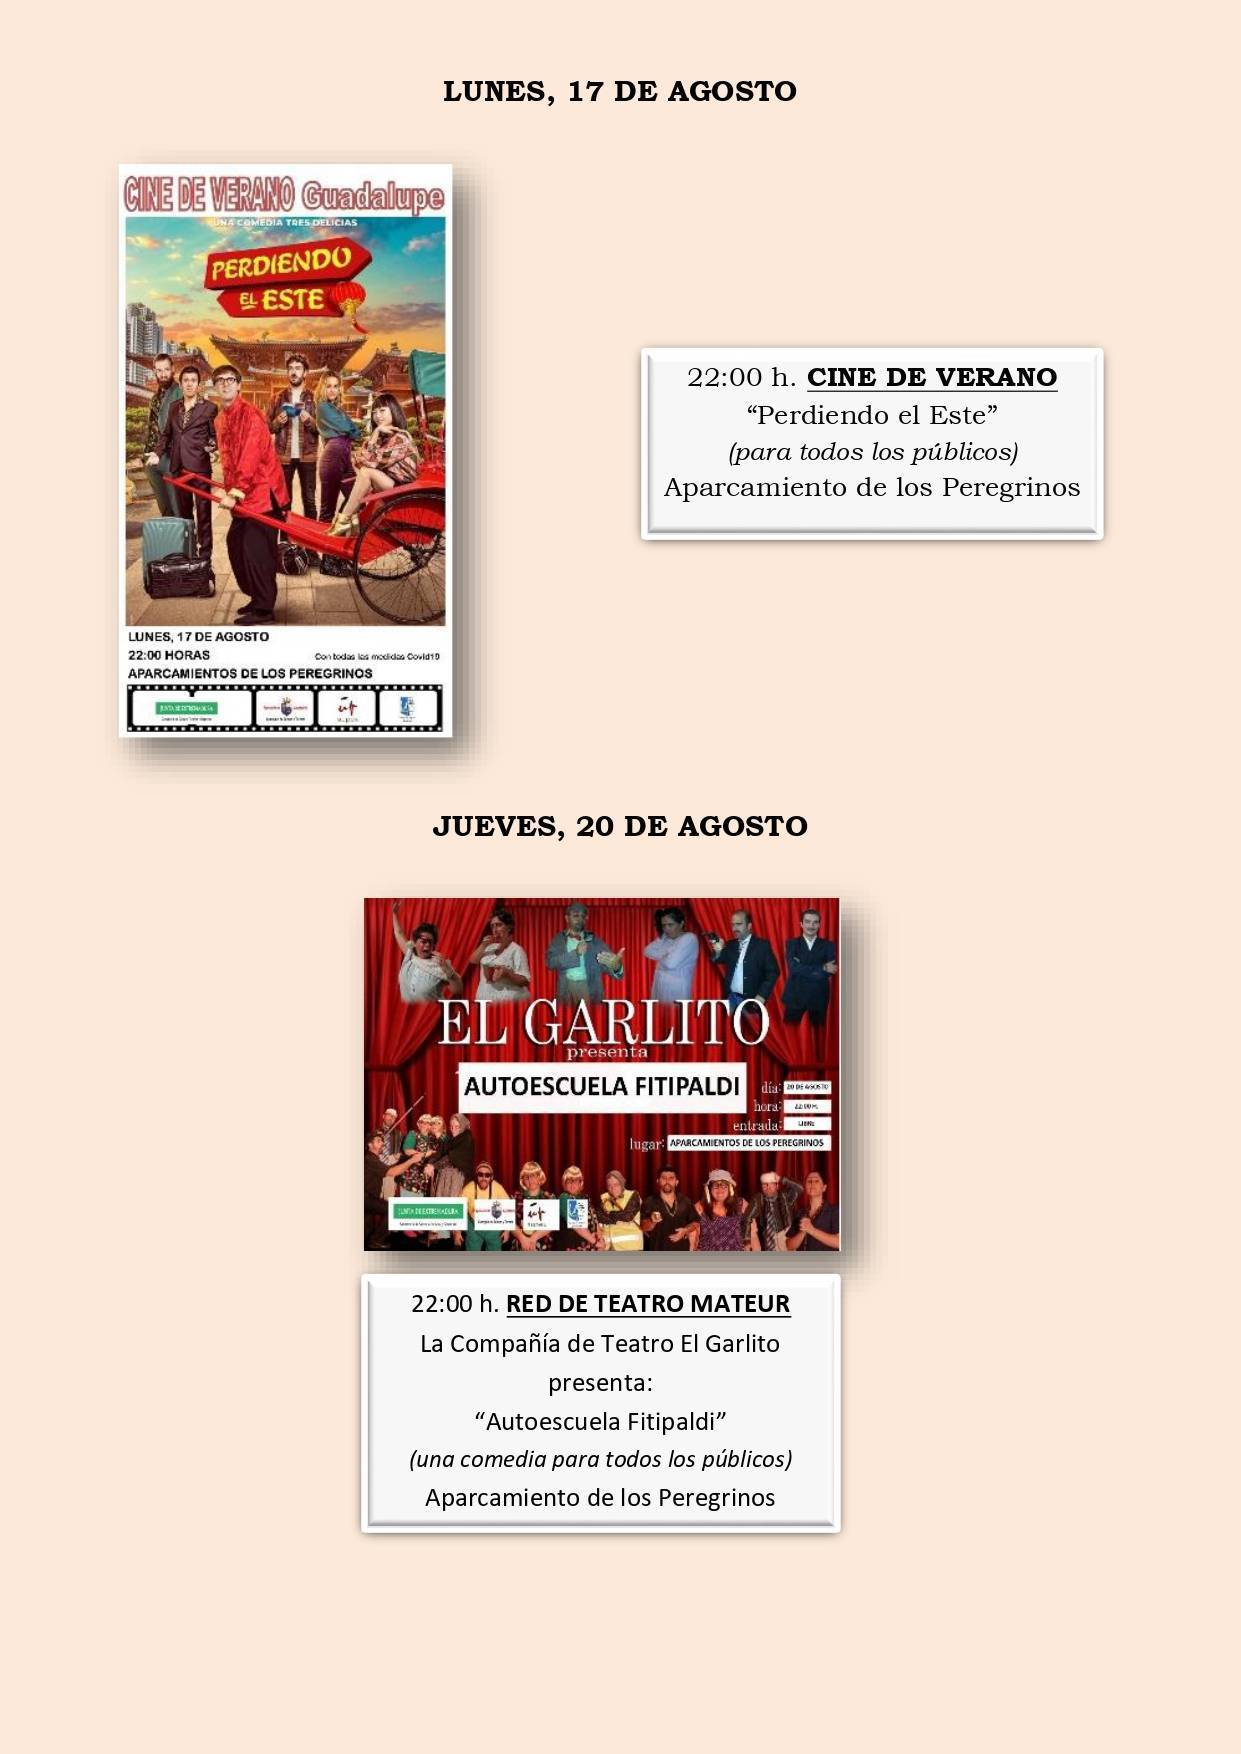 Programa cultural de verano 2020 - Guadalupe (Cáceres) 6